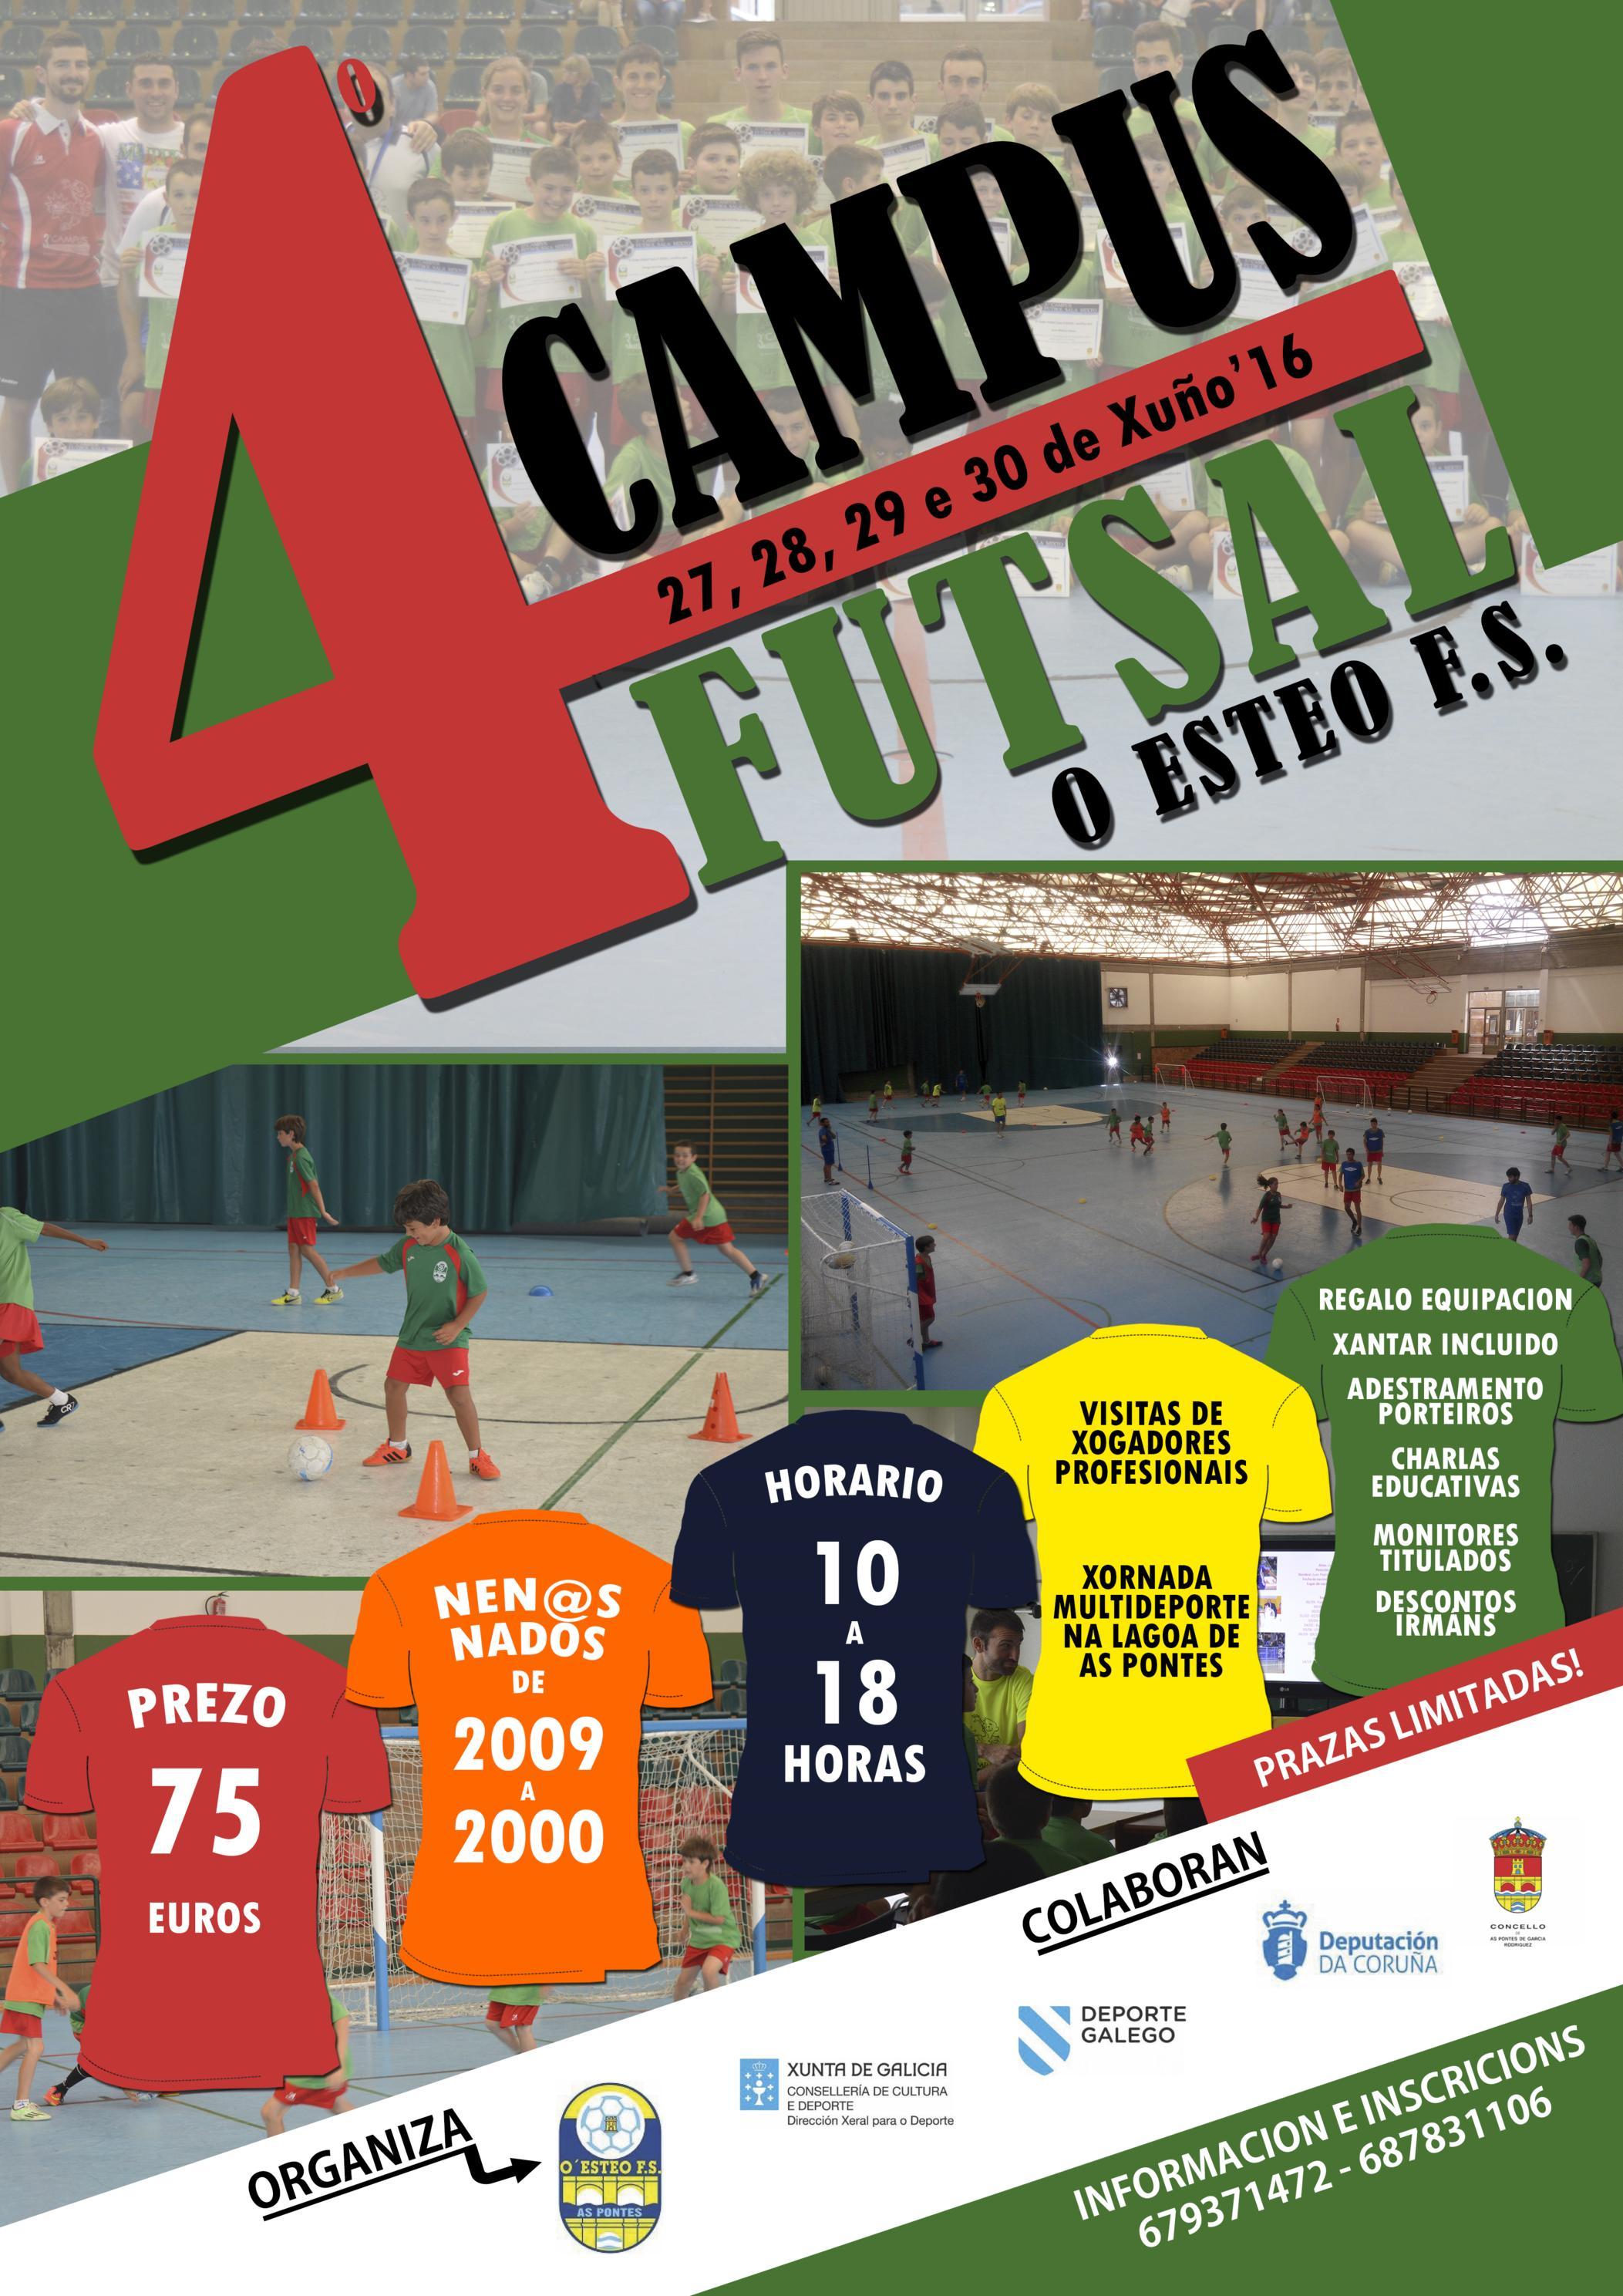 4CAMPUS_FUTSAL-O_ESTEO-FS